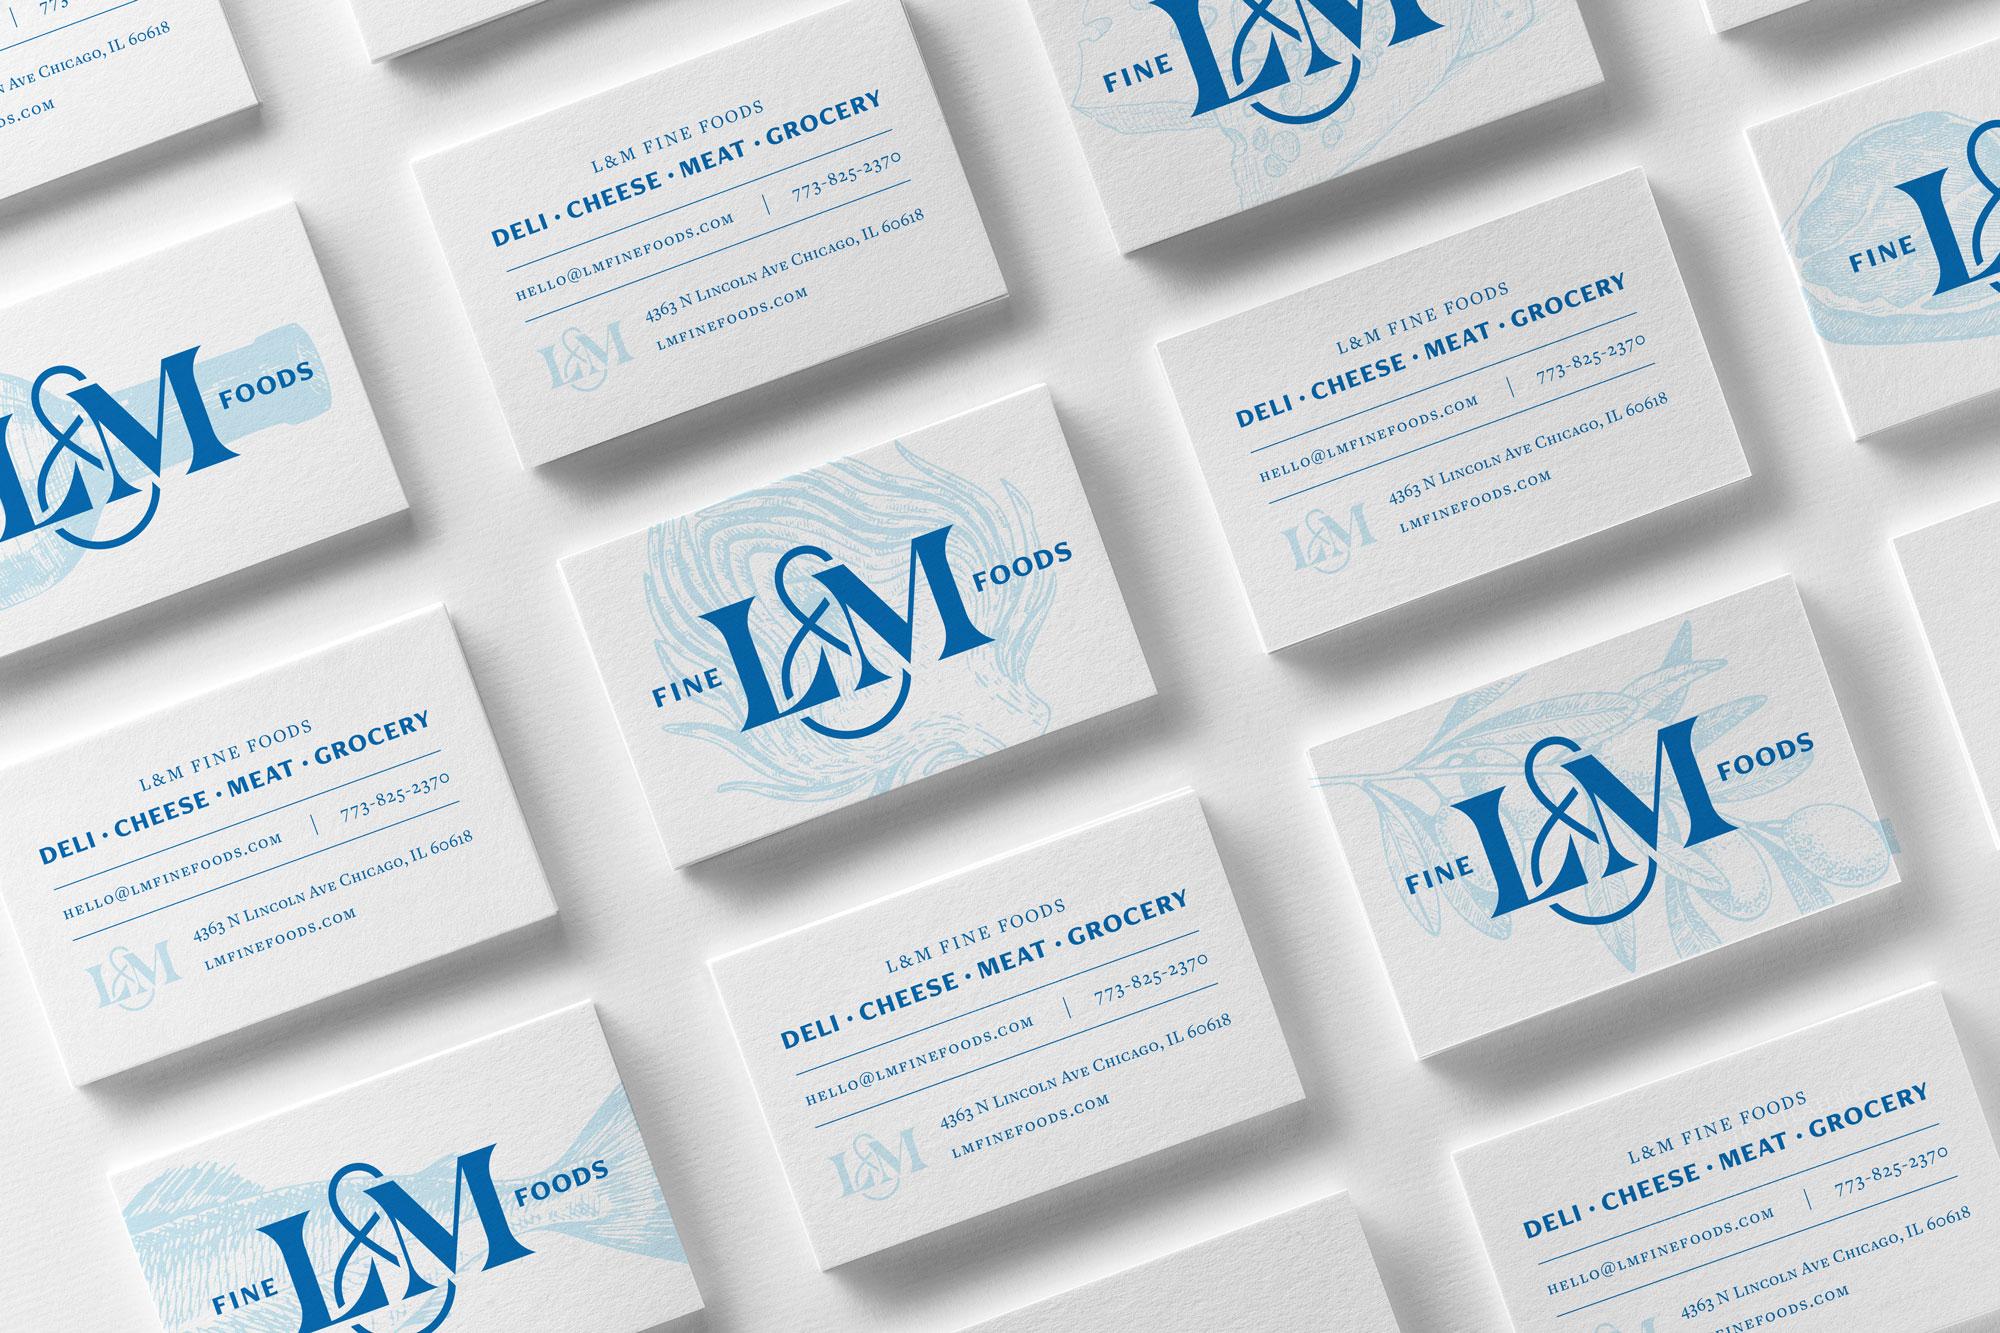 LM-finefoods_business-card_mockup.jpg